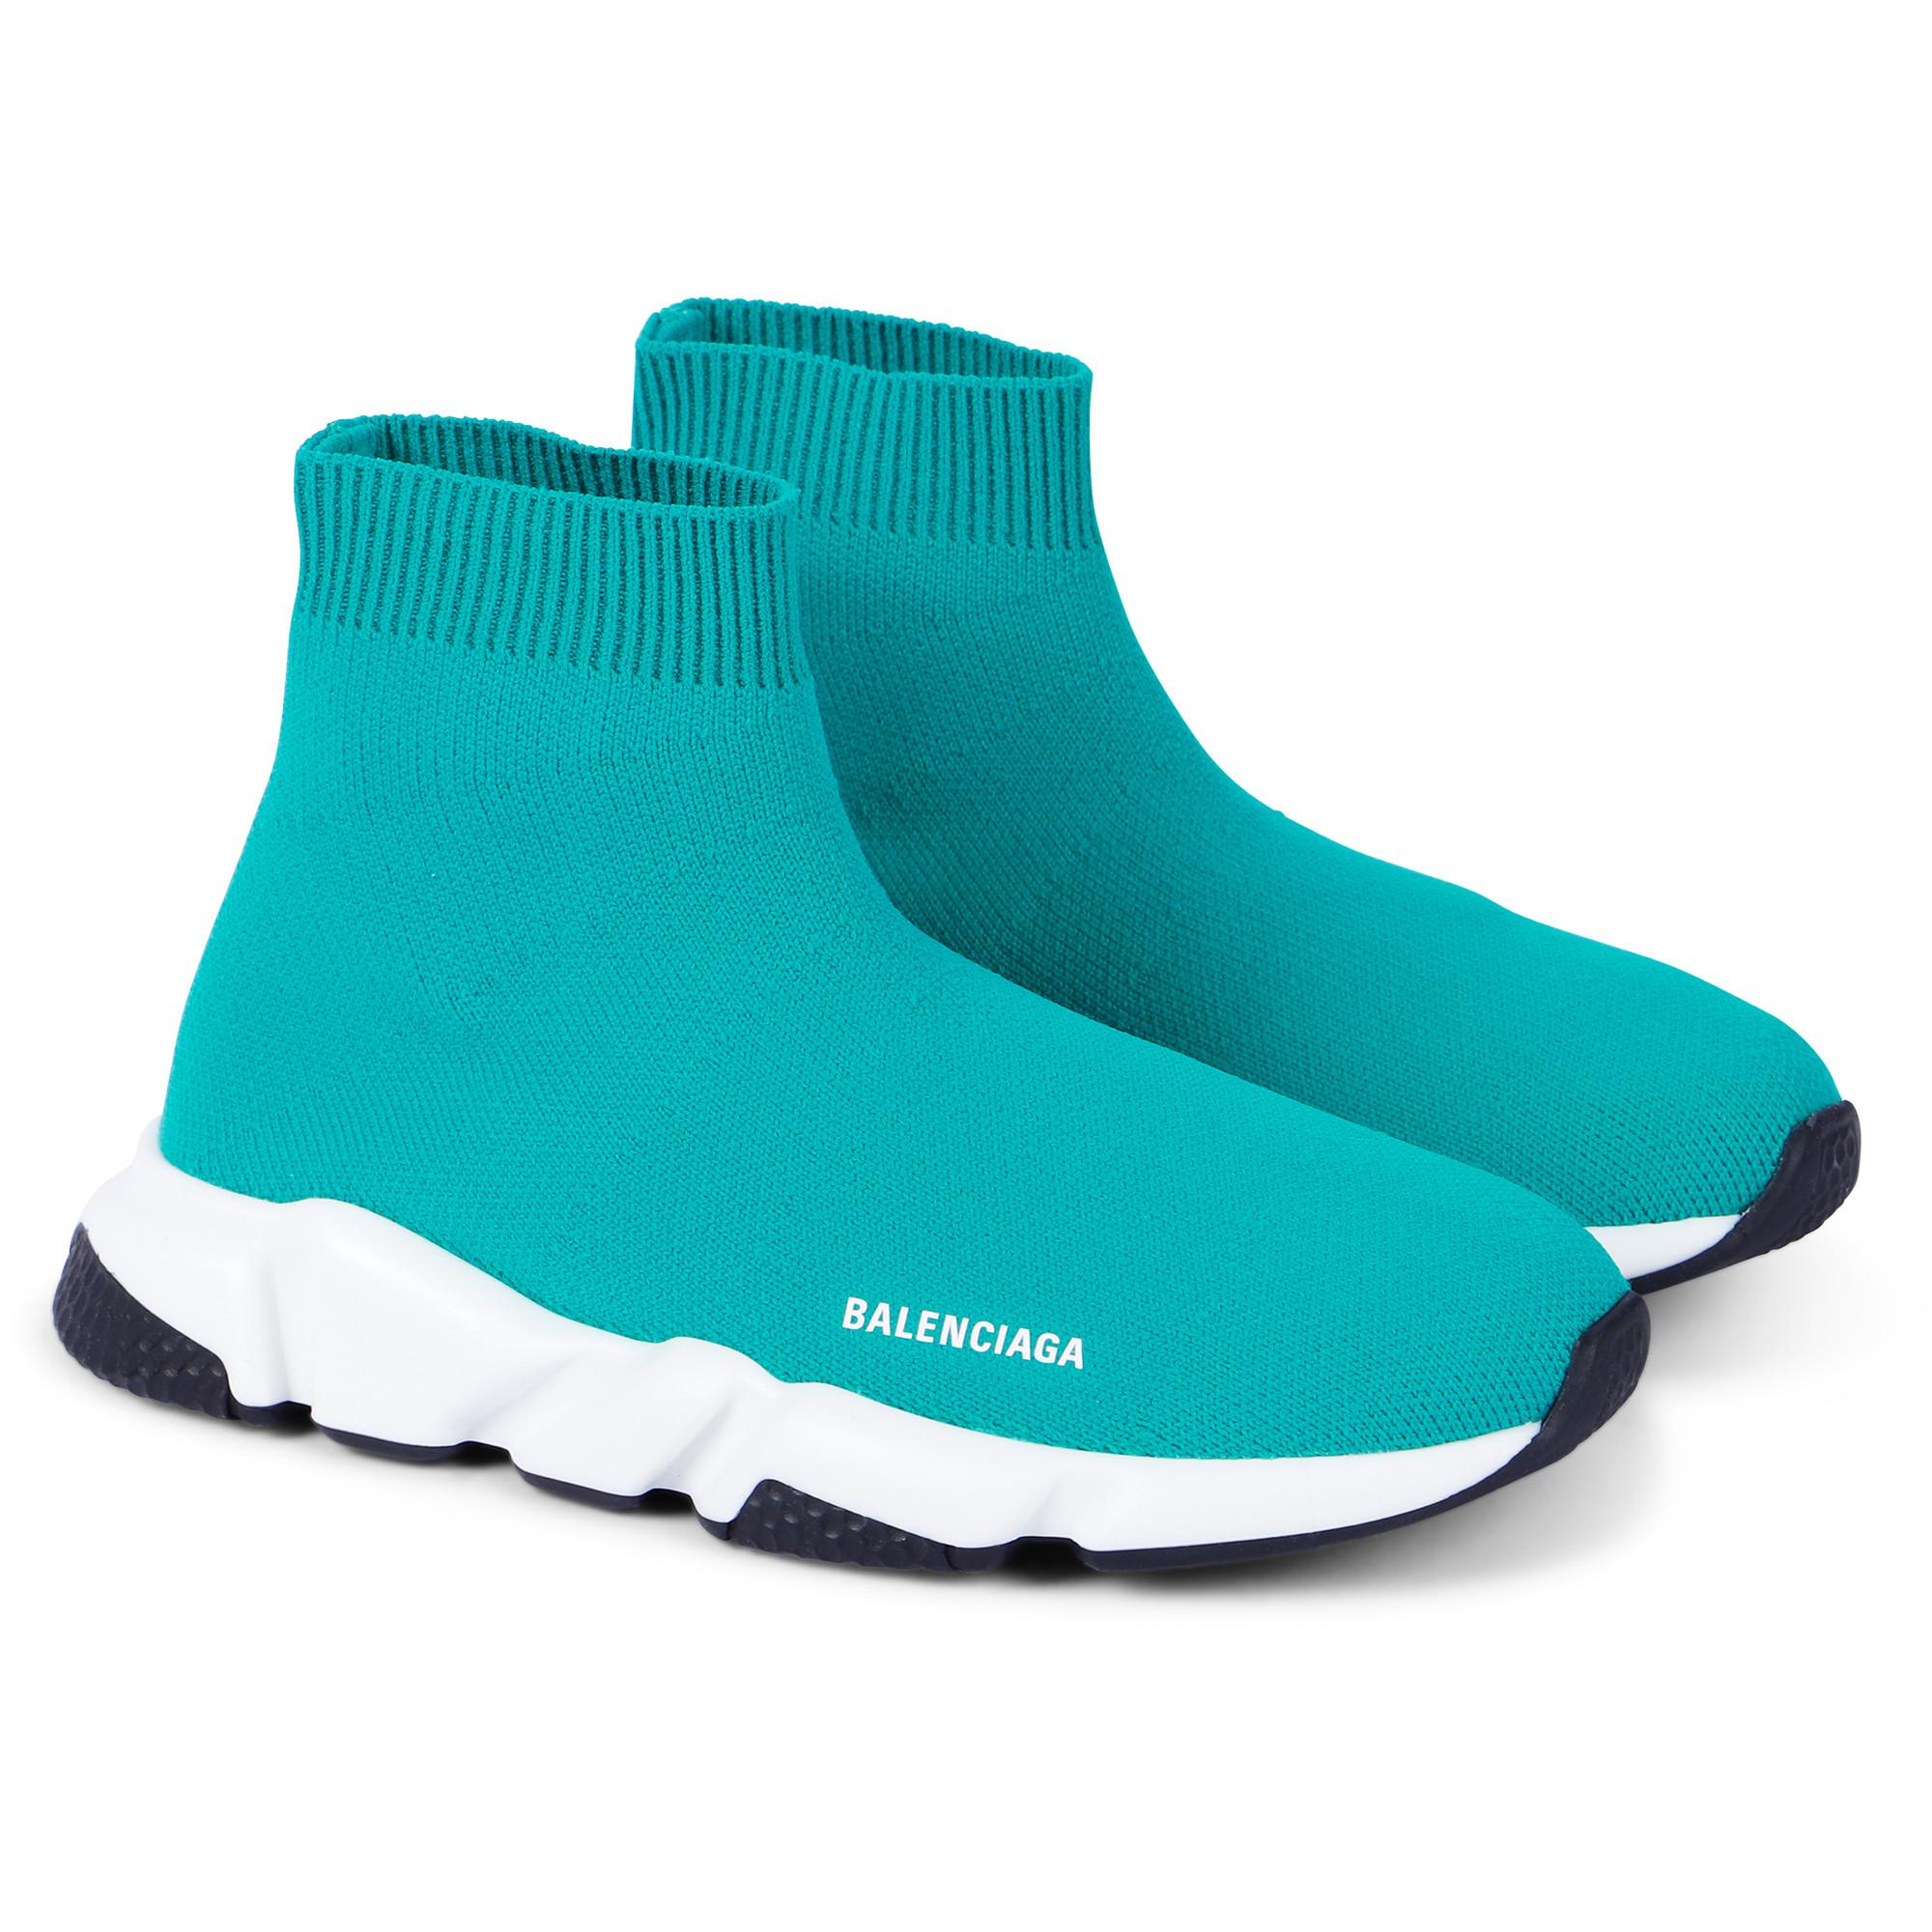 Balenciaga Green Knit Sock Sneakers